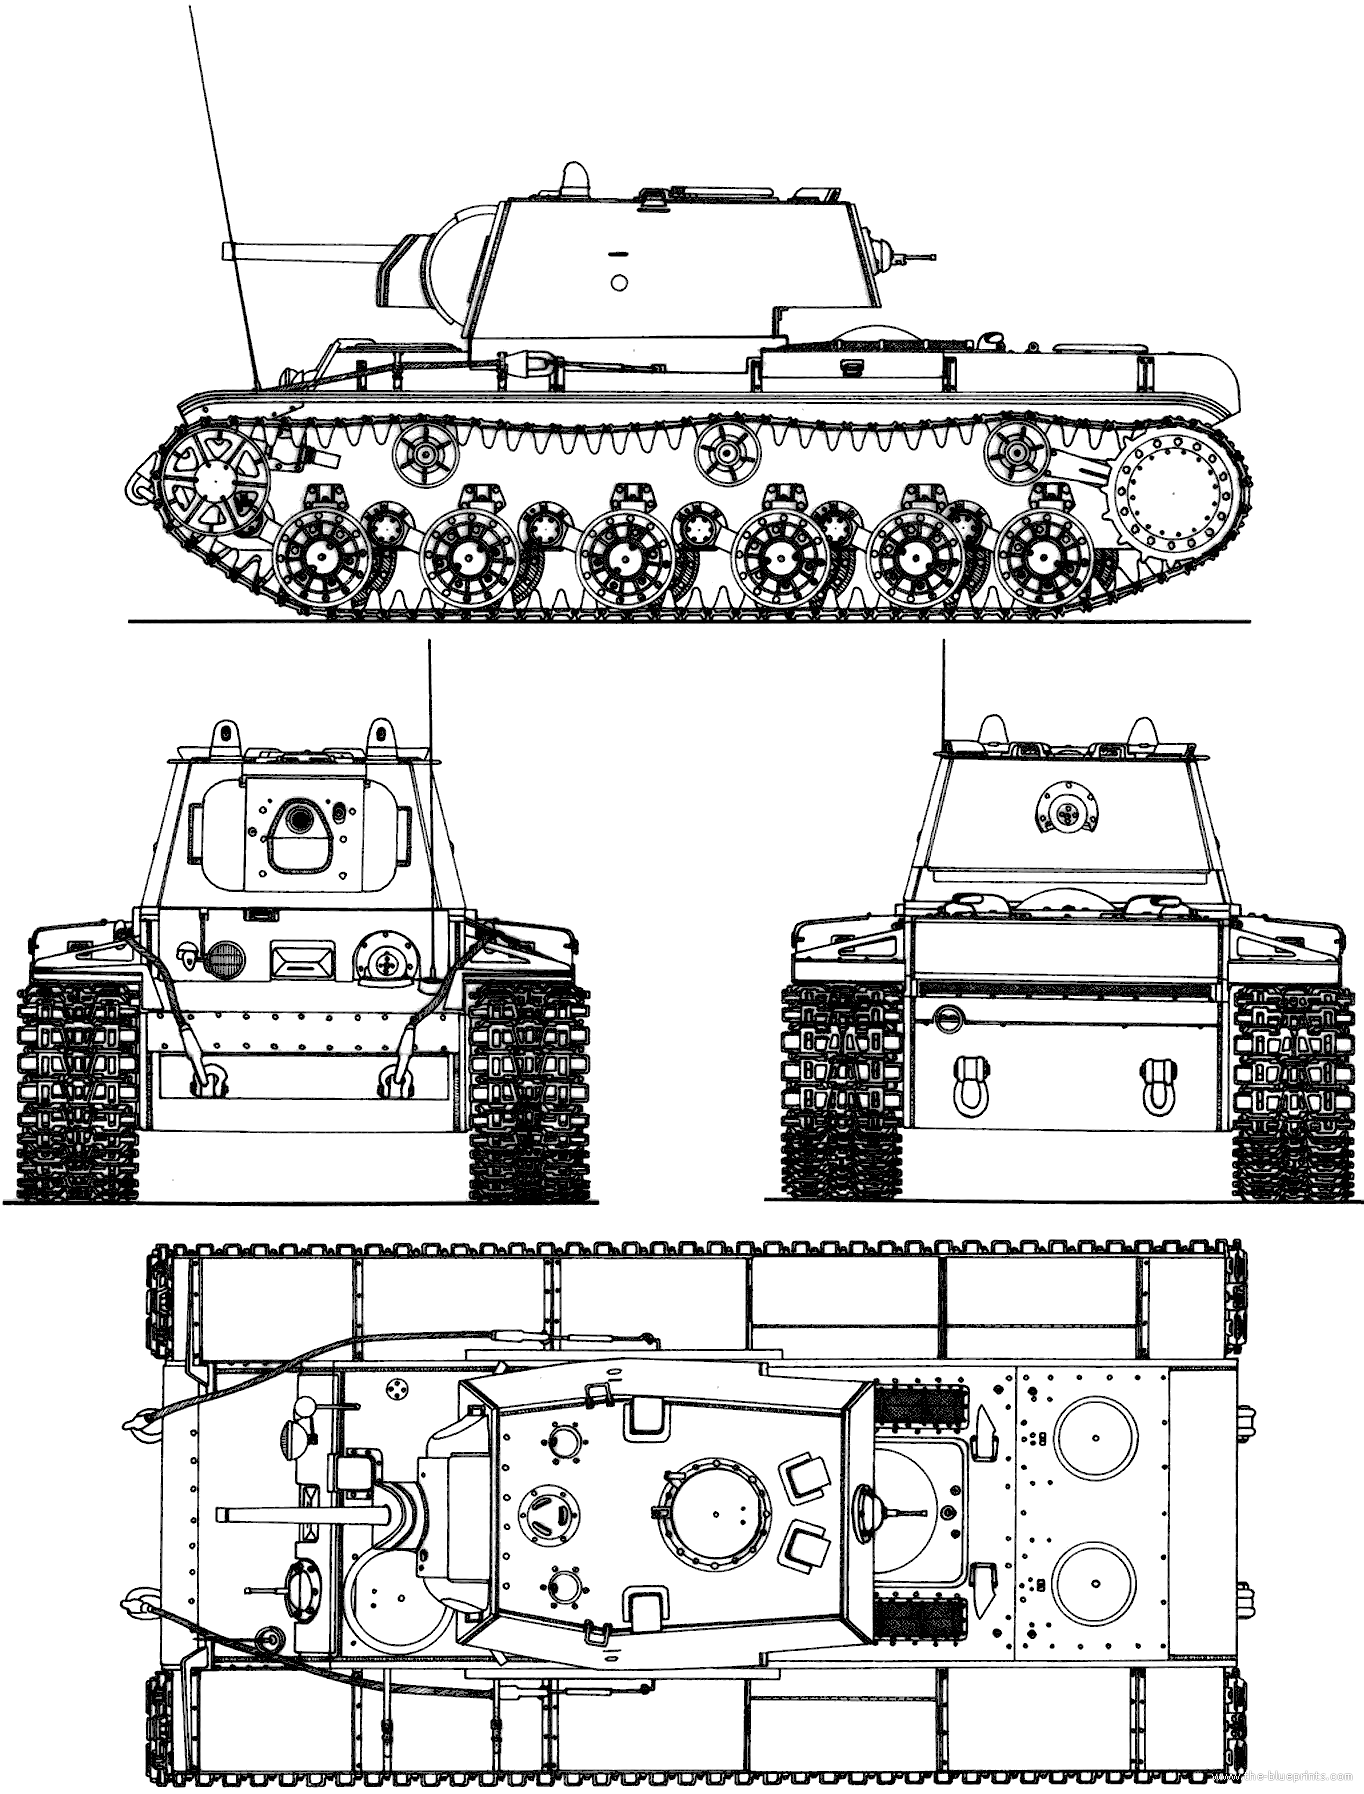 the blueprintscom blueprints tanks